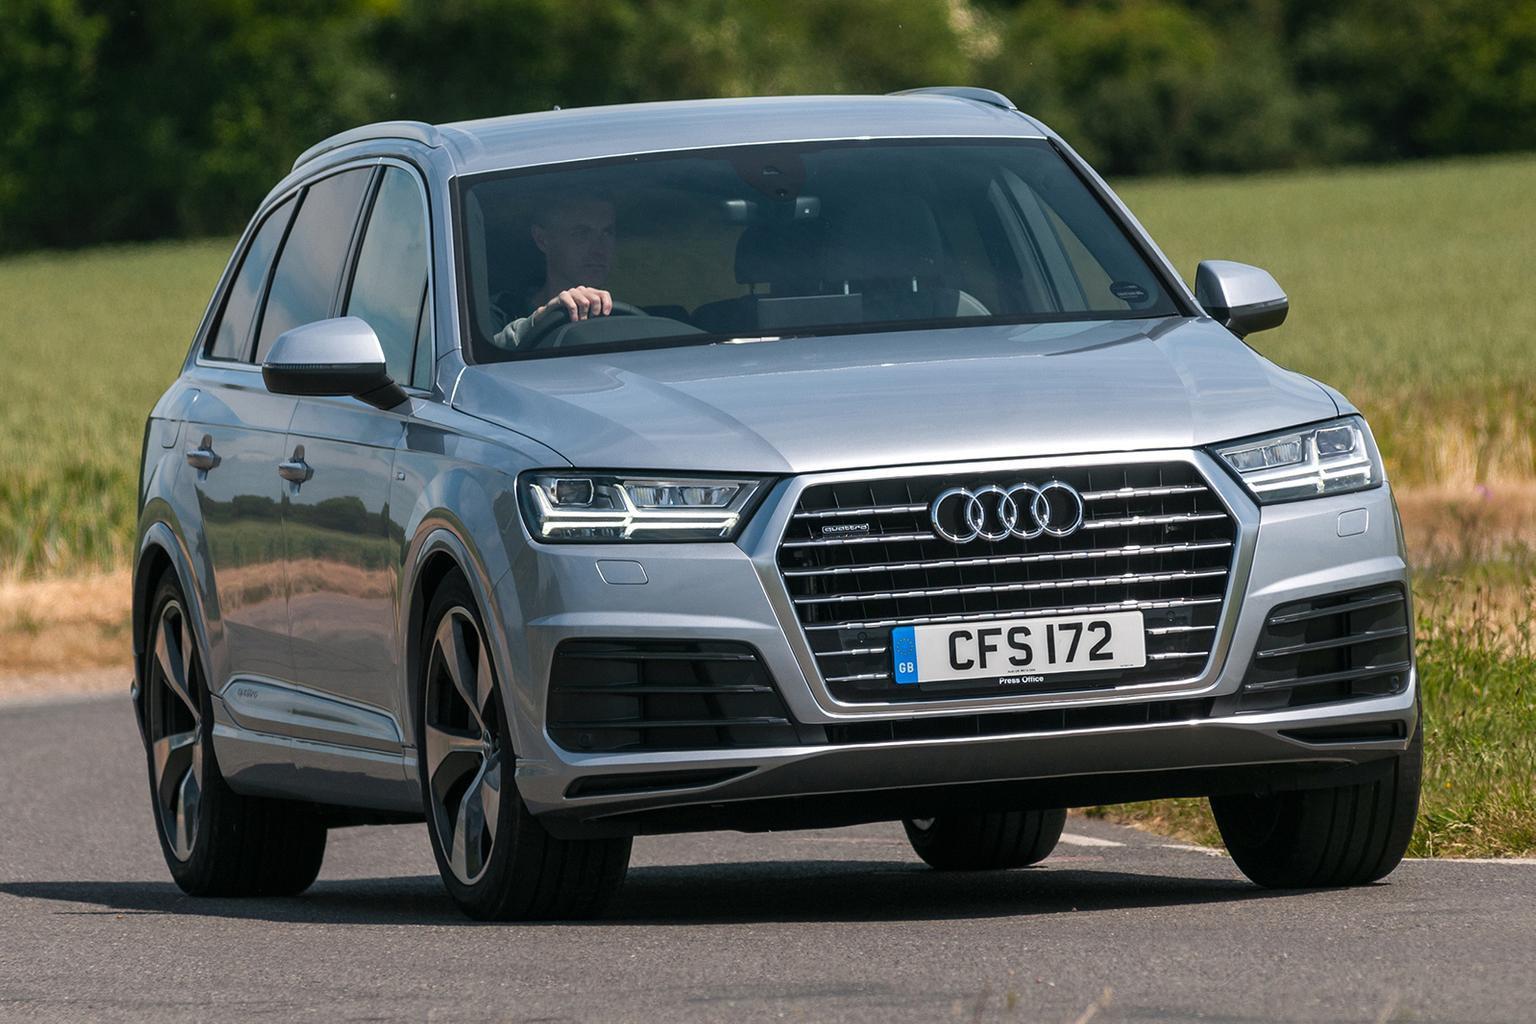 2016 Audi Q7 3.0 TDI 218 review